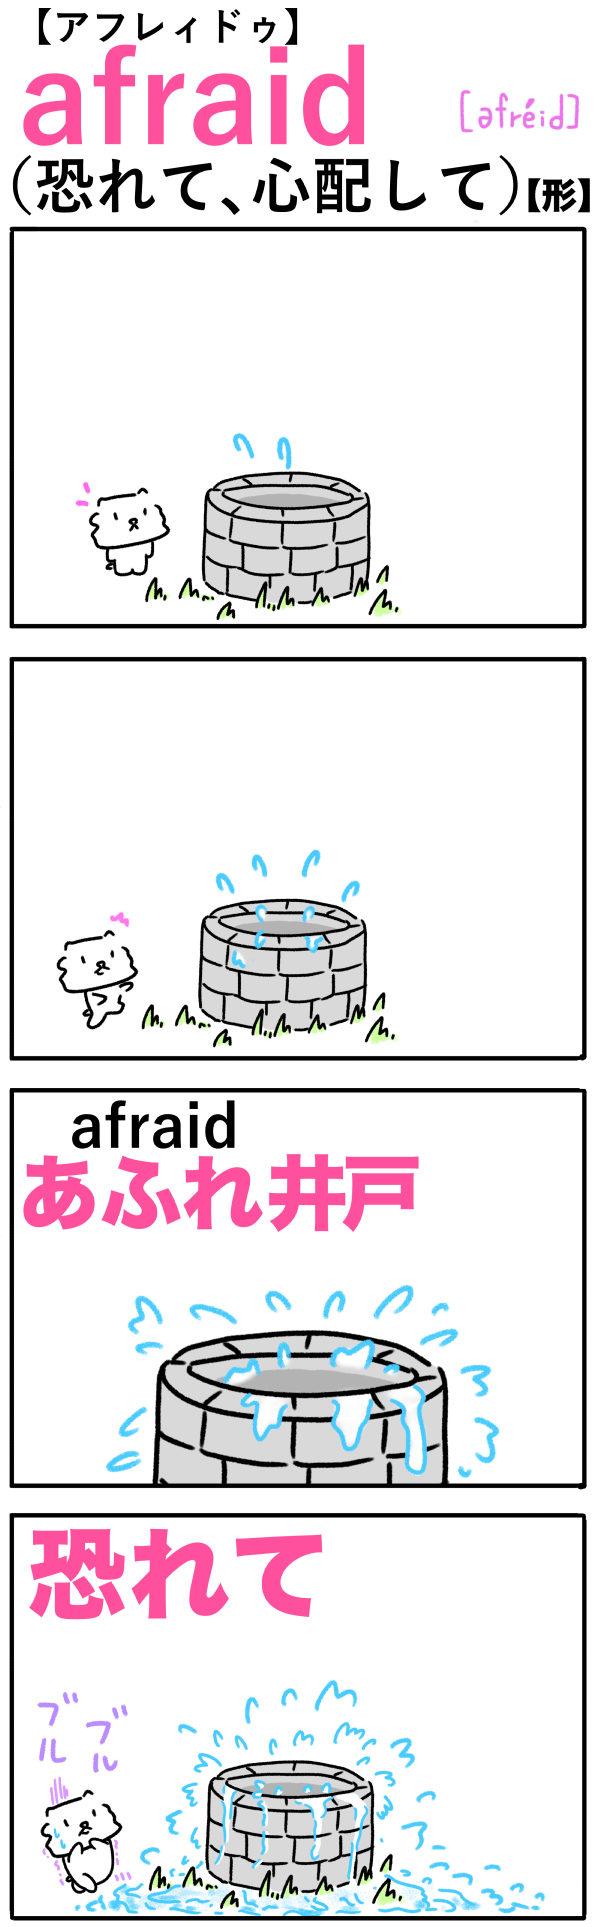 afraid(恐れて)の語呂合わせ英単語